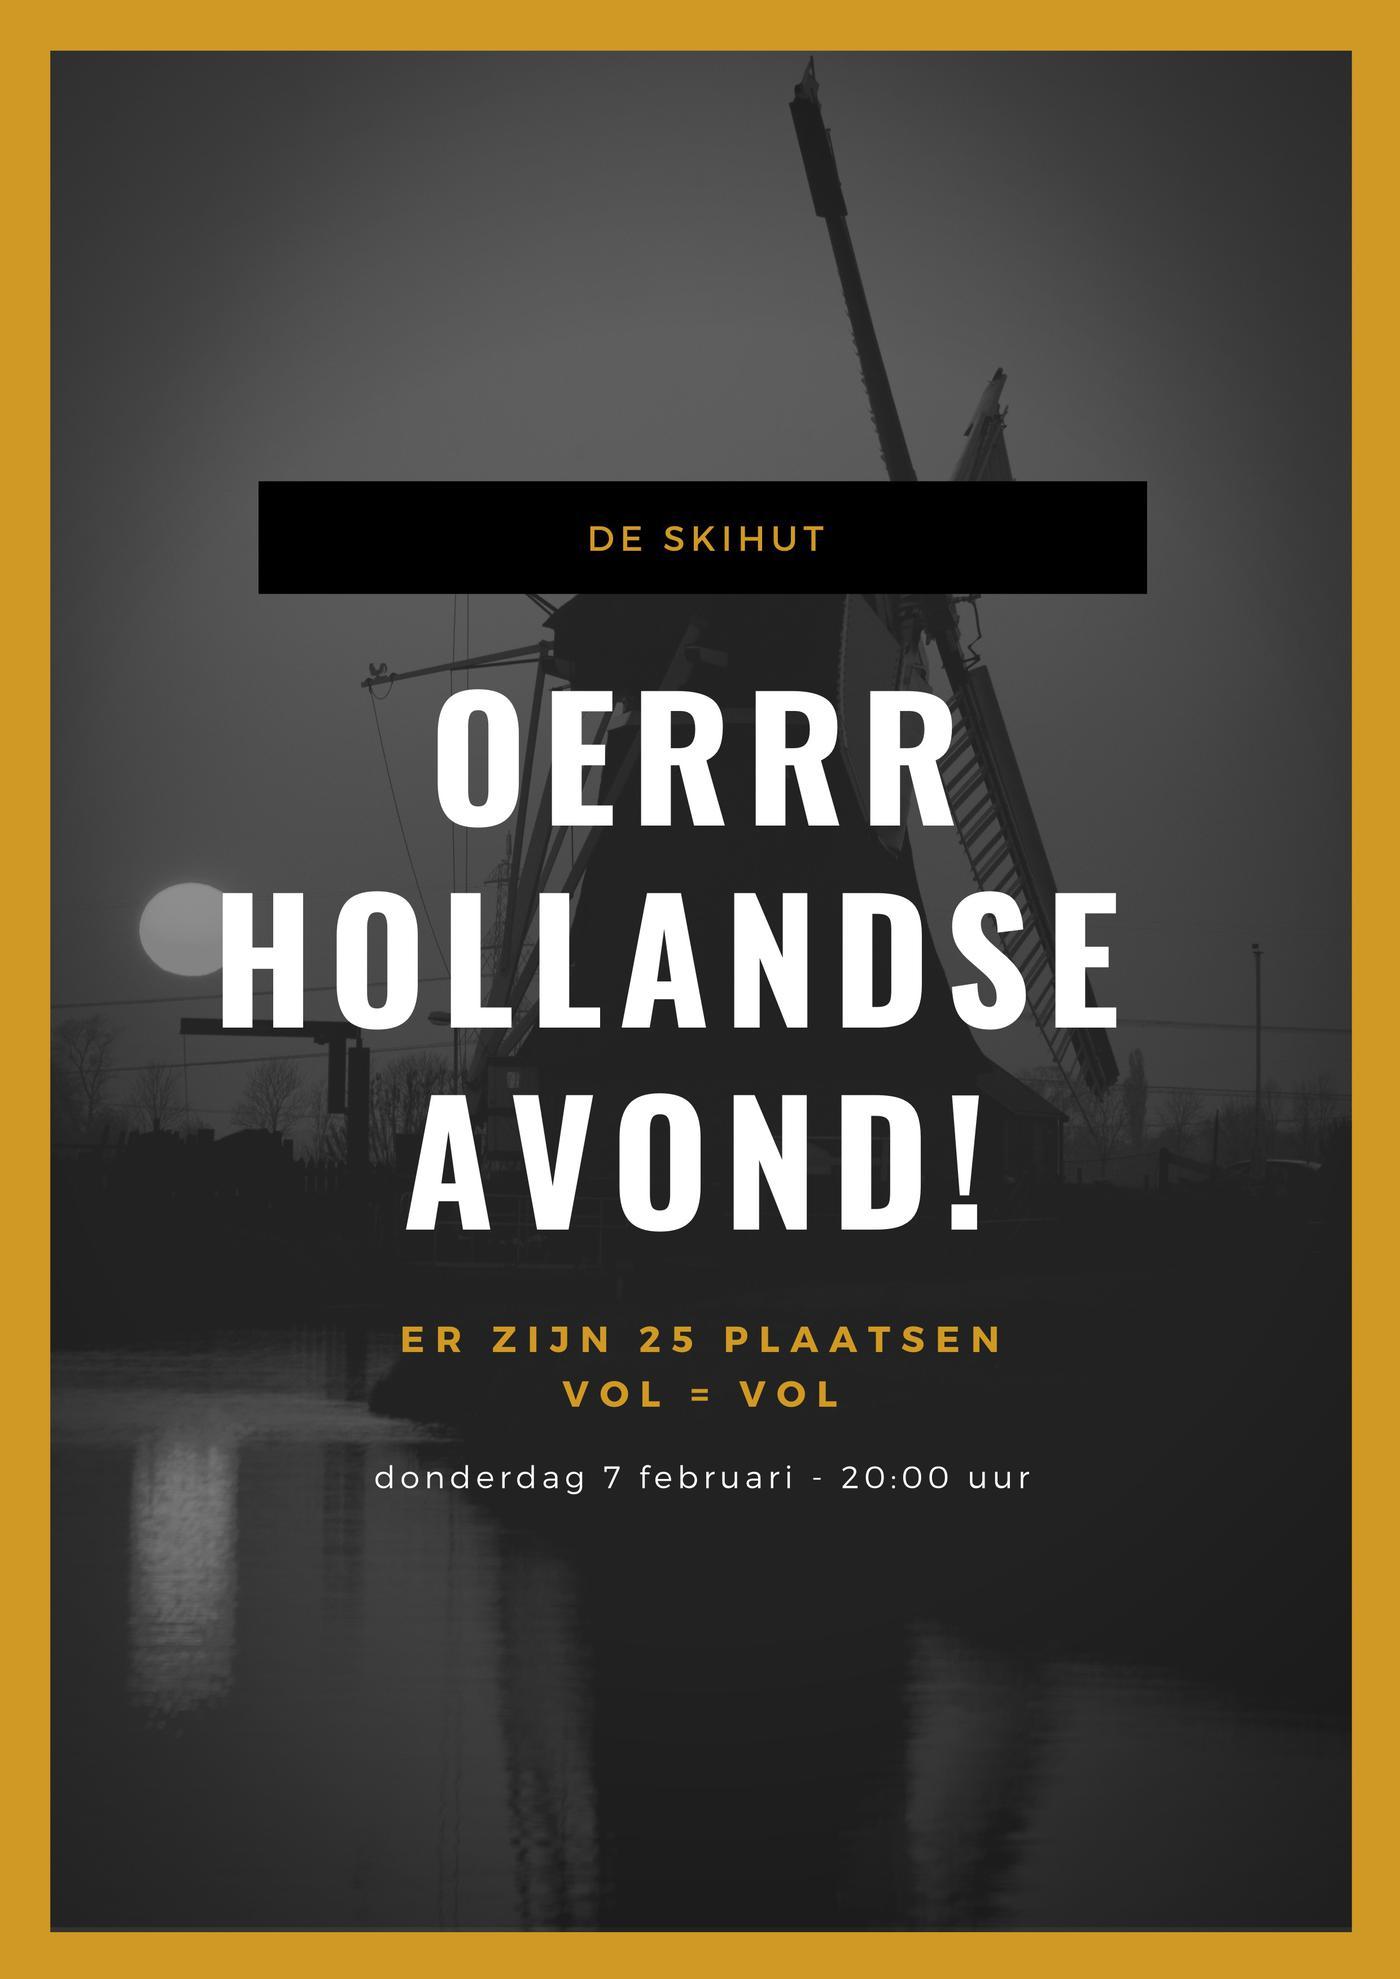 ROT] Hollandse avond